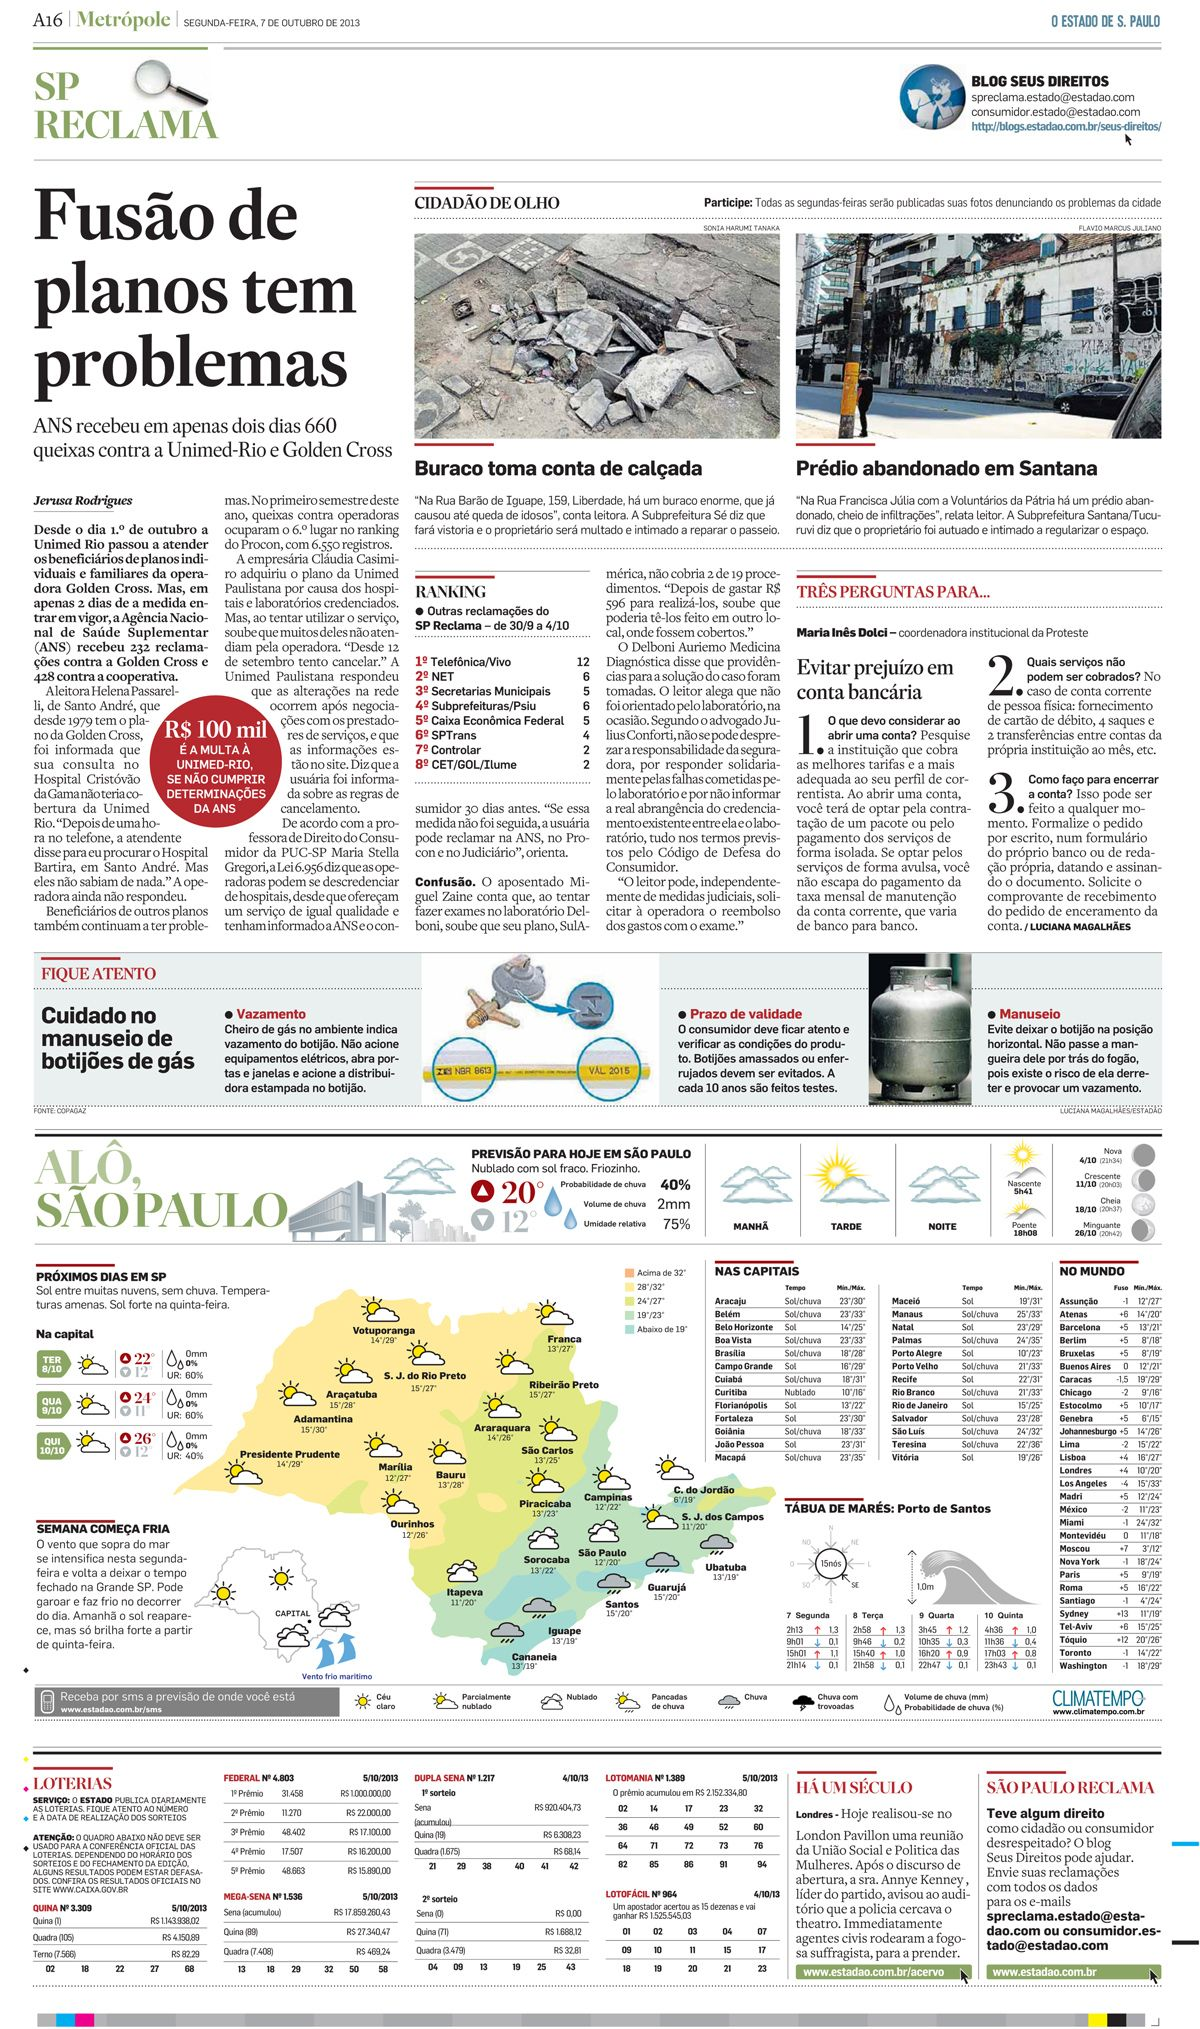 Título: Cuidado no manuseio de botijões de gás; Veículo: O Estado de S. Paulo - Jornal do Carro; Data: 7/10/2013; Cliente: Copagaz.